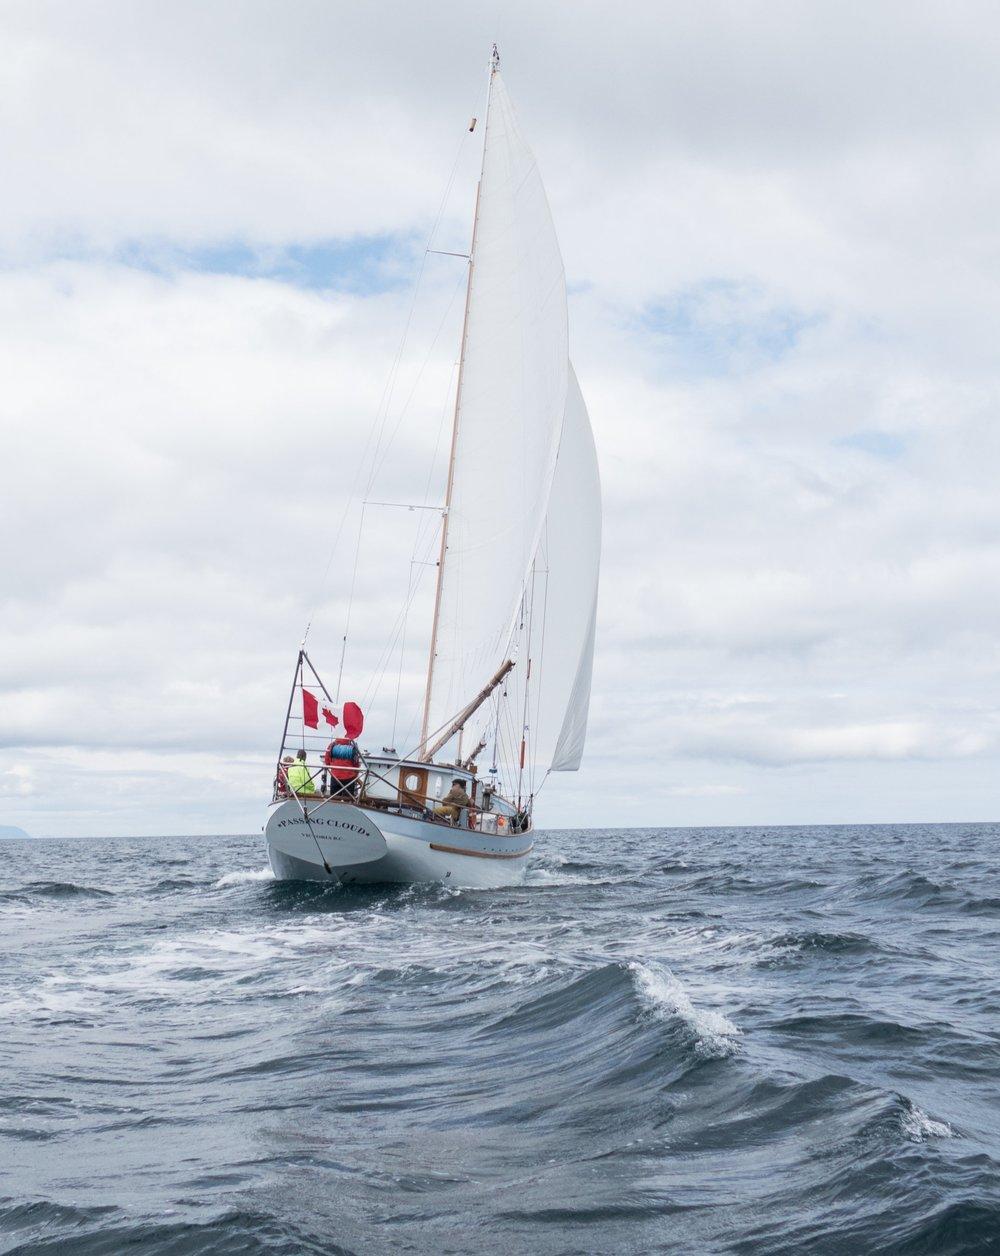 Schooner  Passing Cloud  sailing off Haida Gwaii